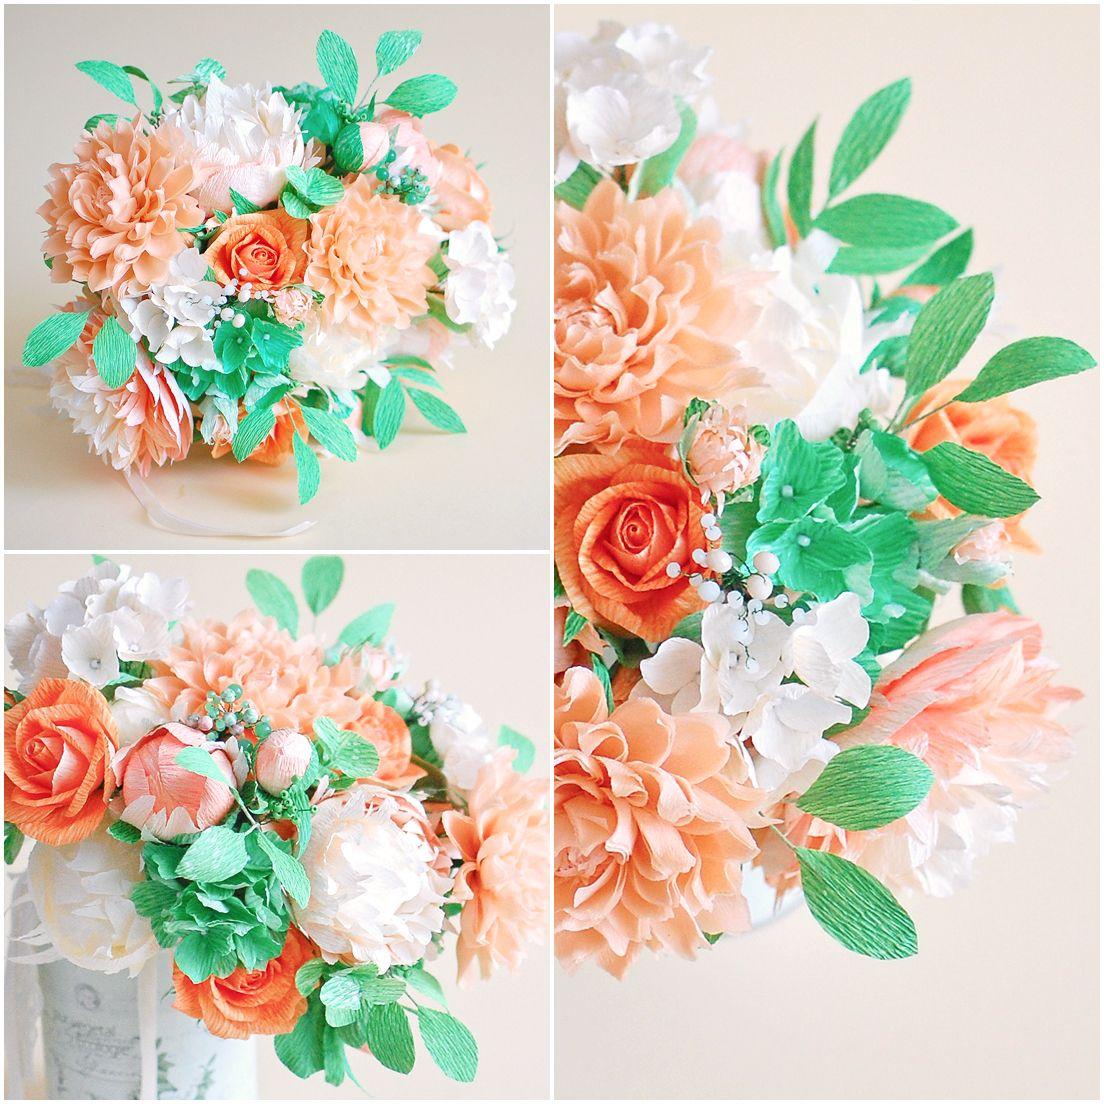 Paper flowers bridal bouquet salmon pink paper flowers paper flowers bridal bouquet salmon pink izmirmasajfo